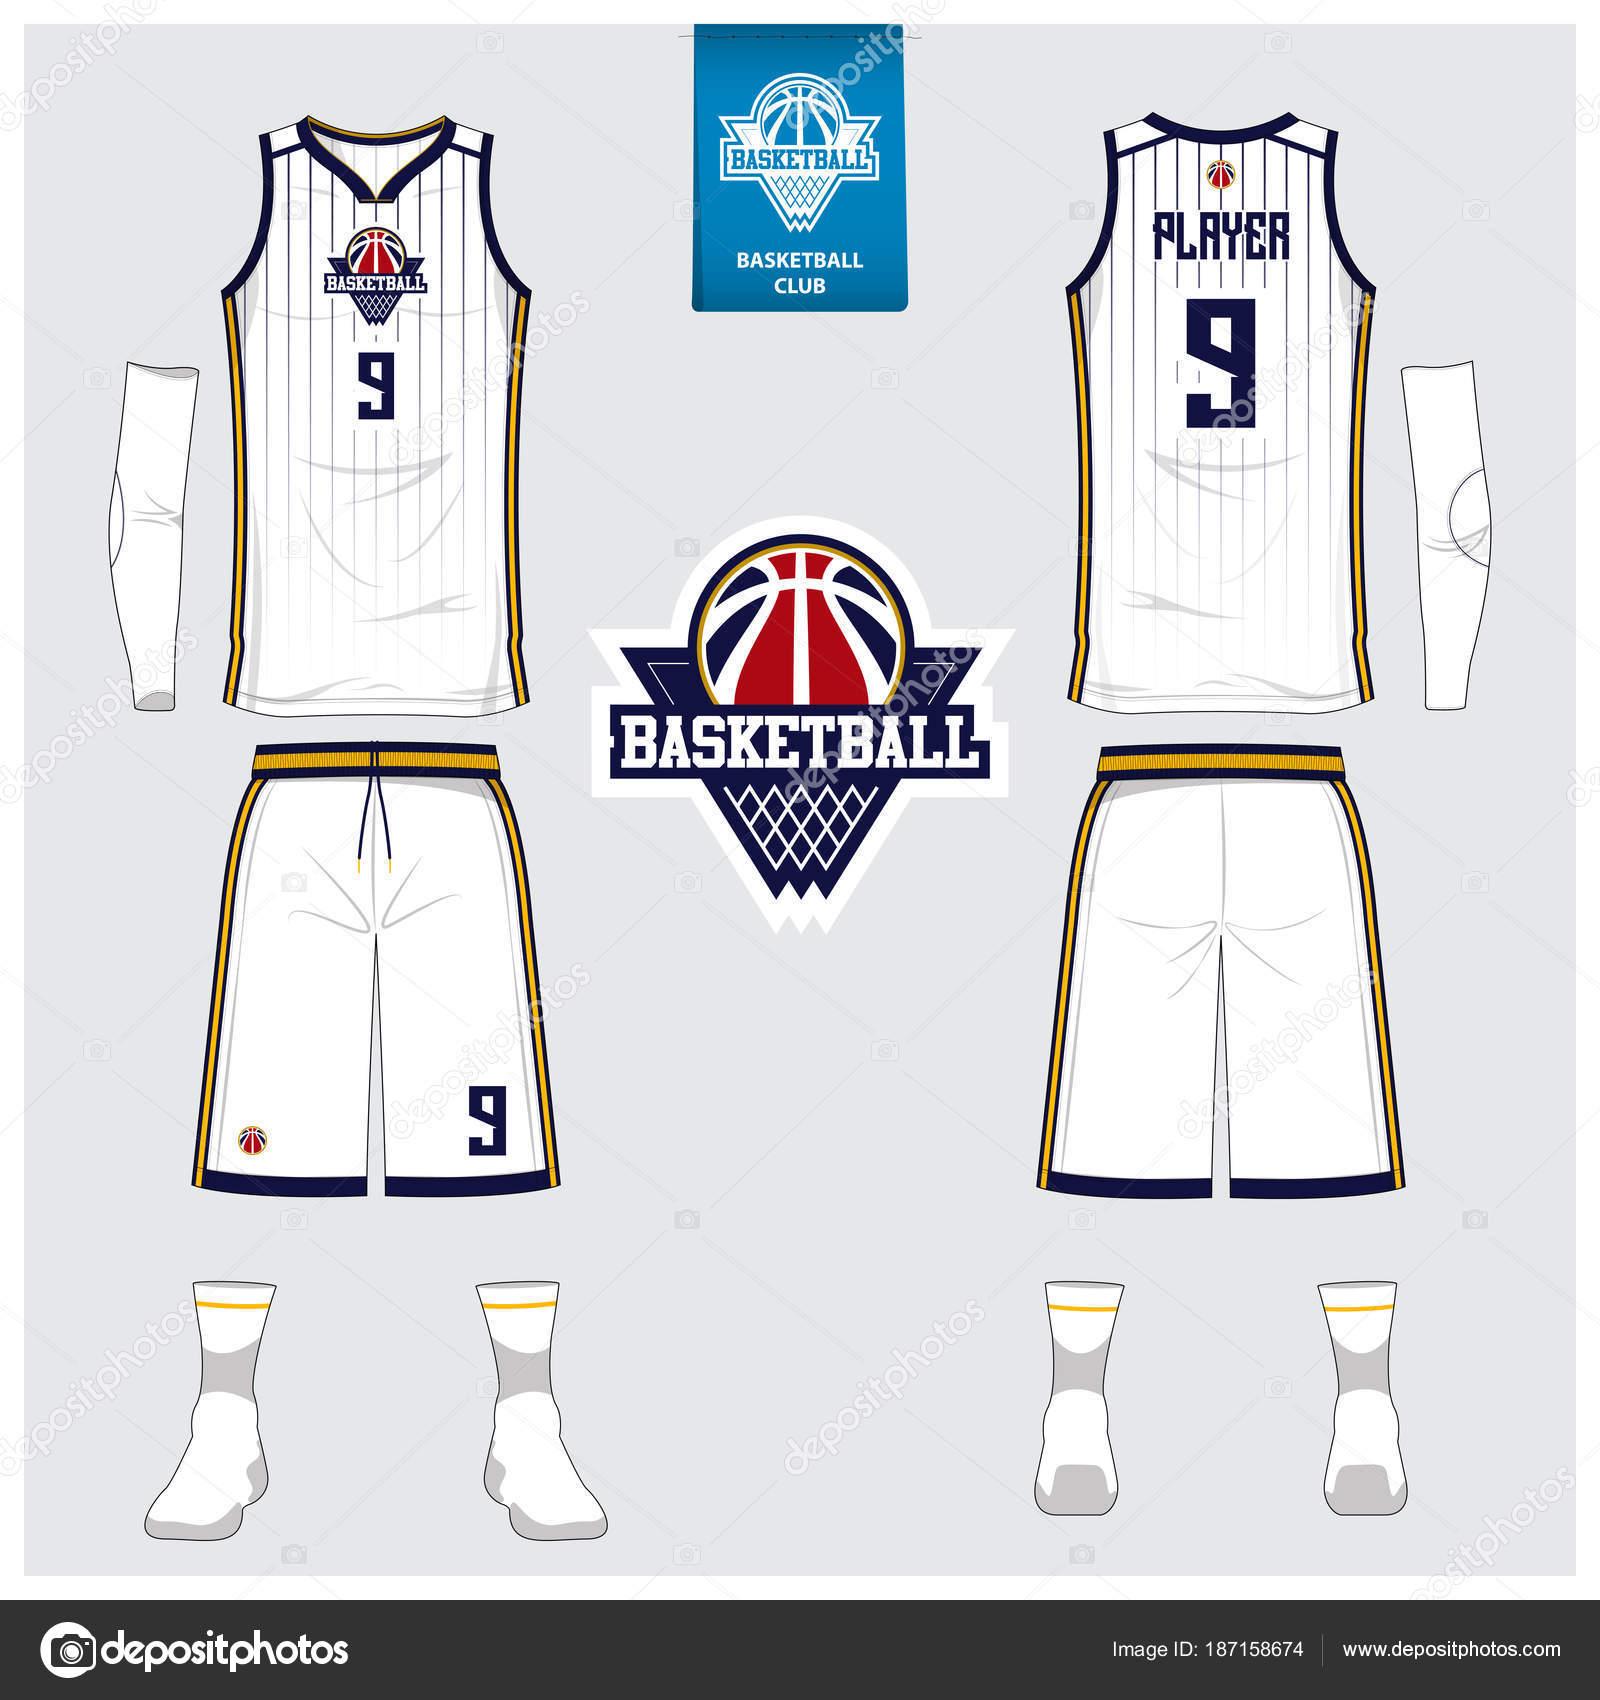 Per Uniforme MagliaPantalonciniCalze Basket O Modello Club Sport PN8nwXZO0k